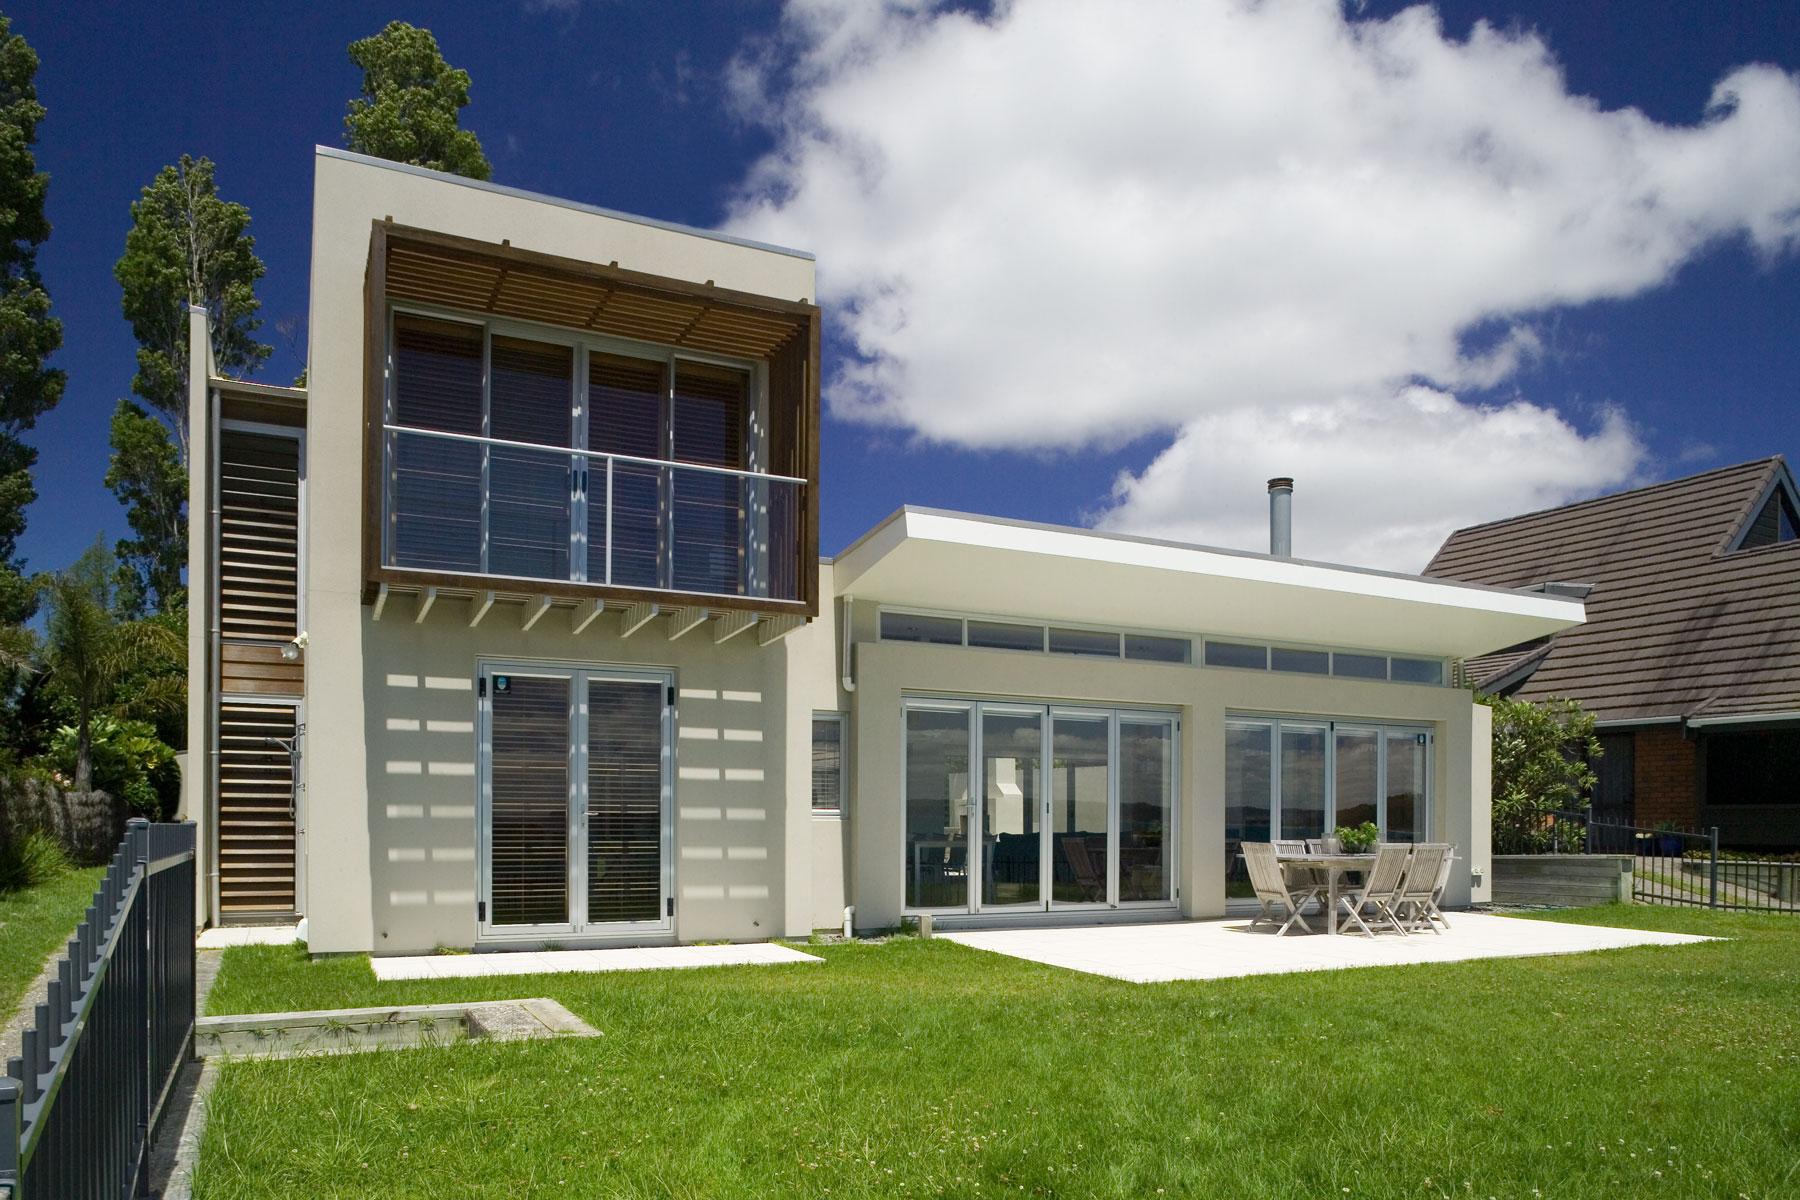 S Leuschke Kahn Architects_StanmoreBay LKA_F2J95804.jpg